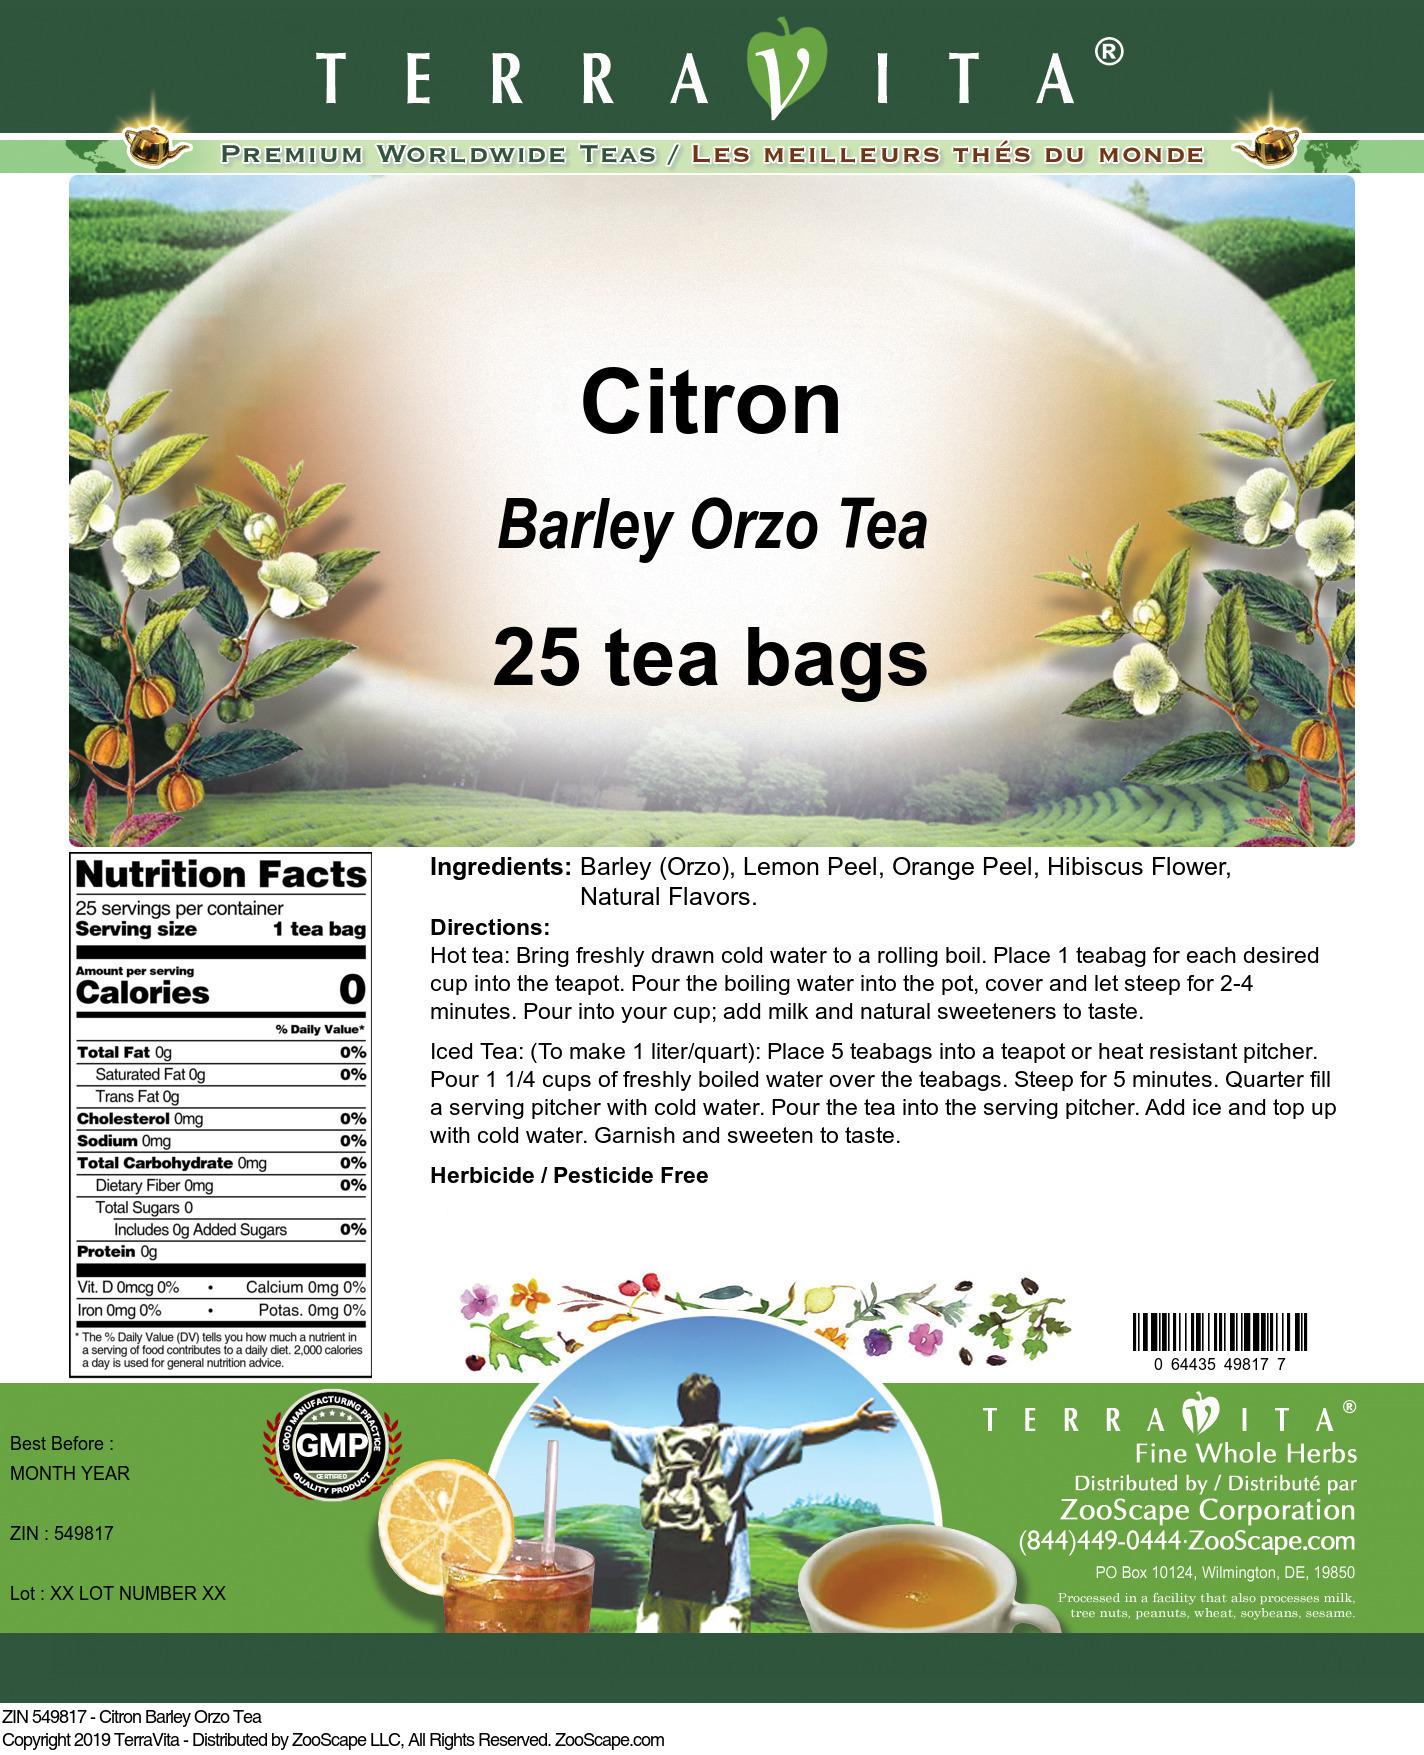 Citron Barley Orzo